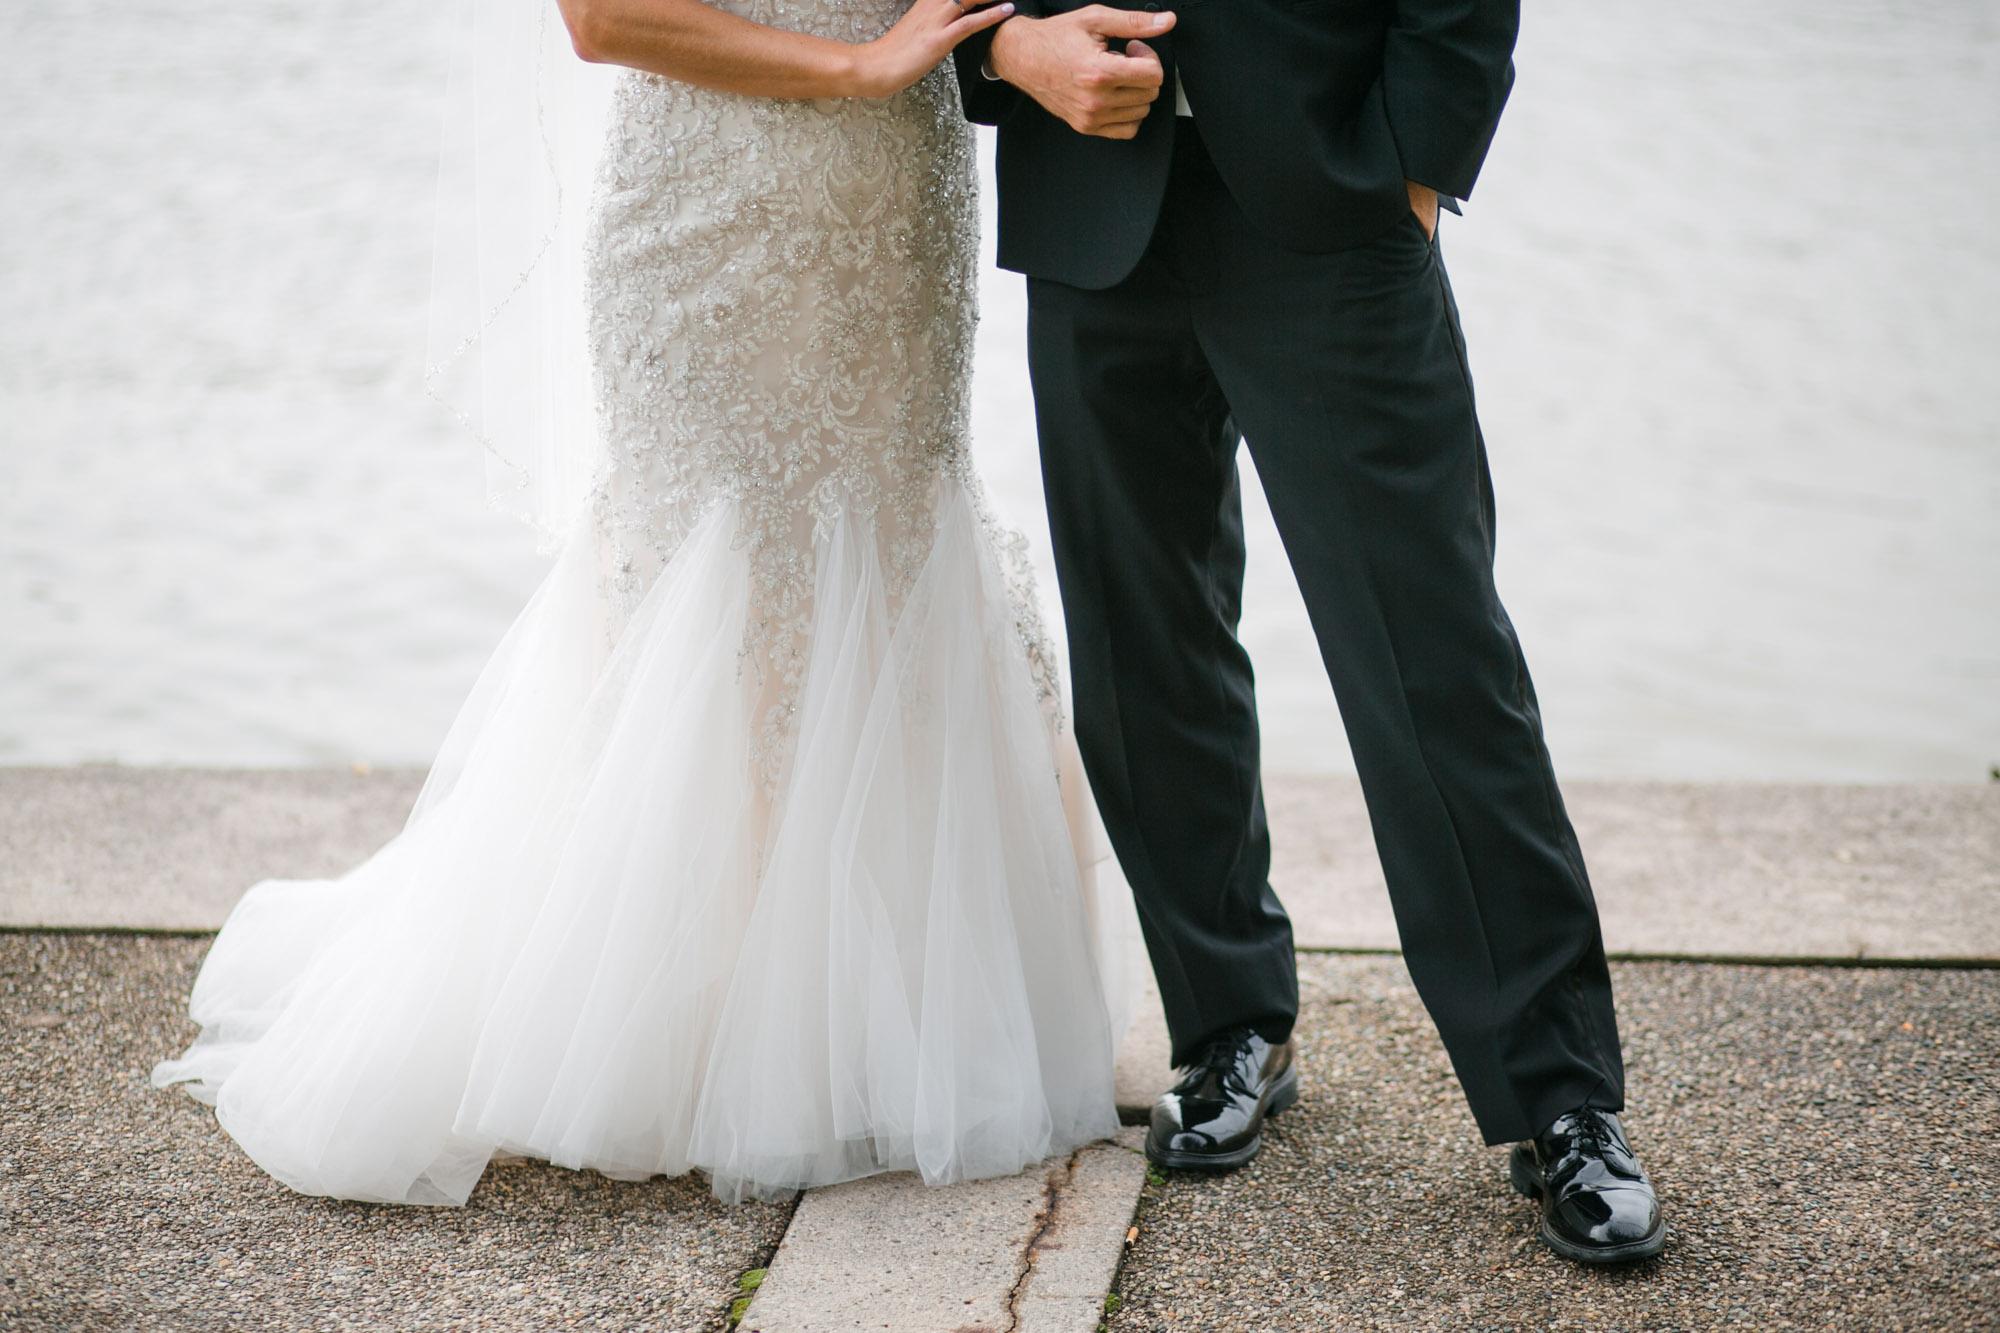 hensville-wedding-downtown-toledo-ohio (68 of 103).jpg